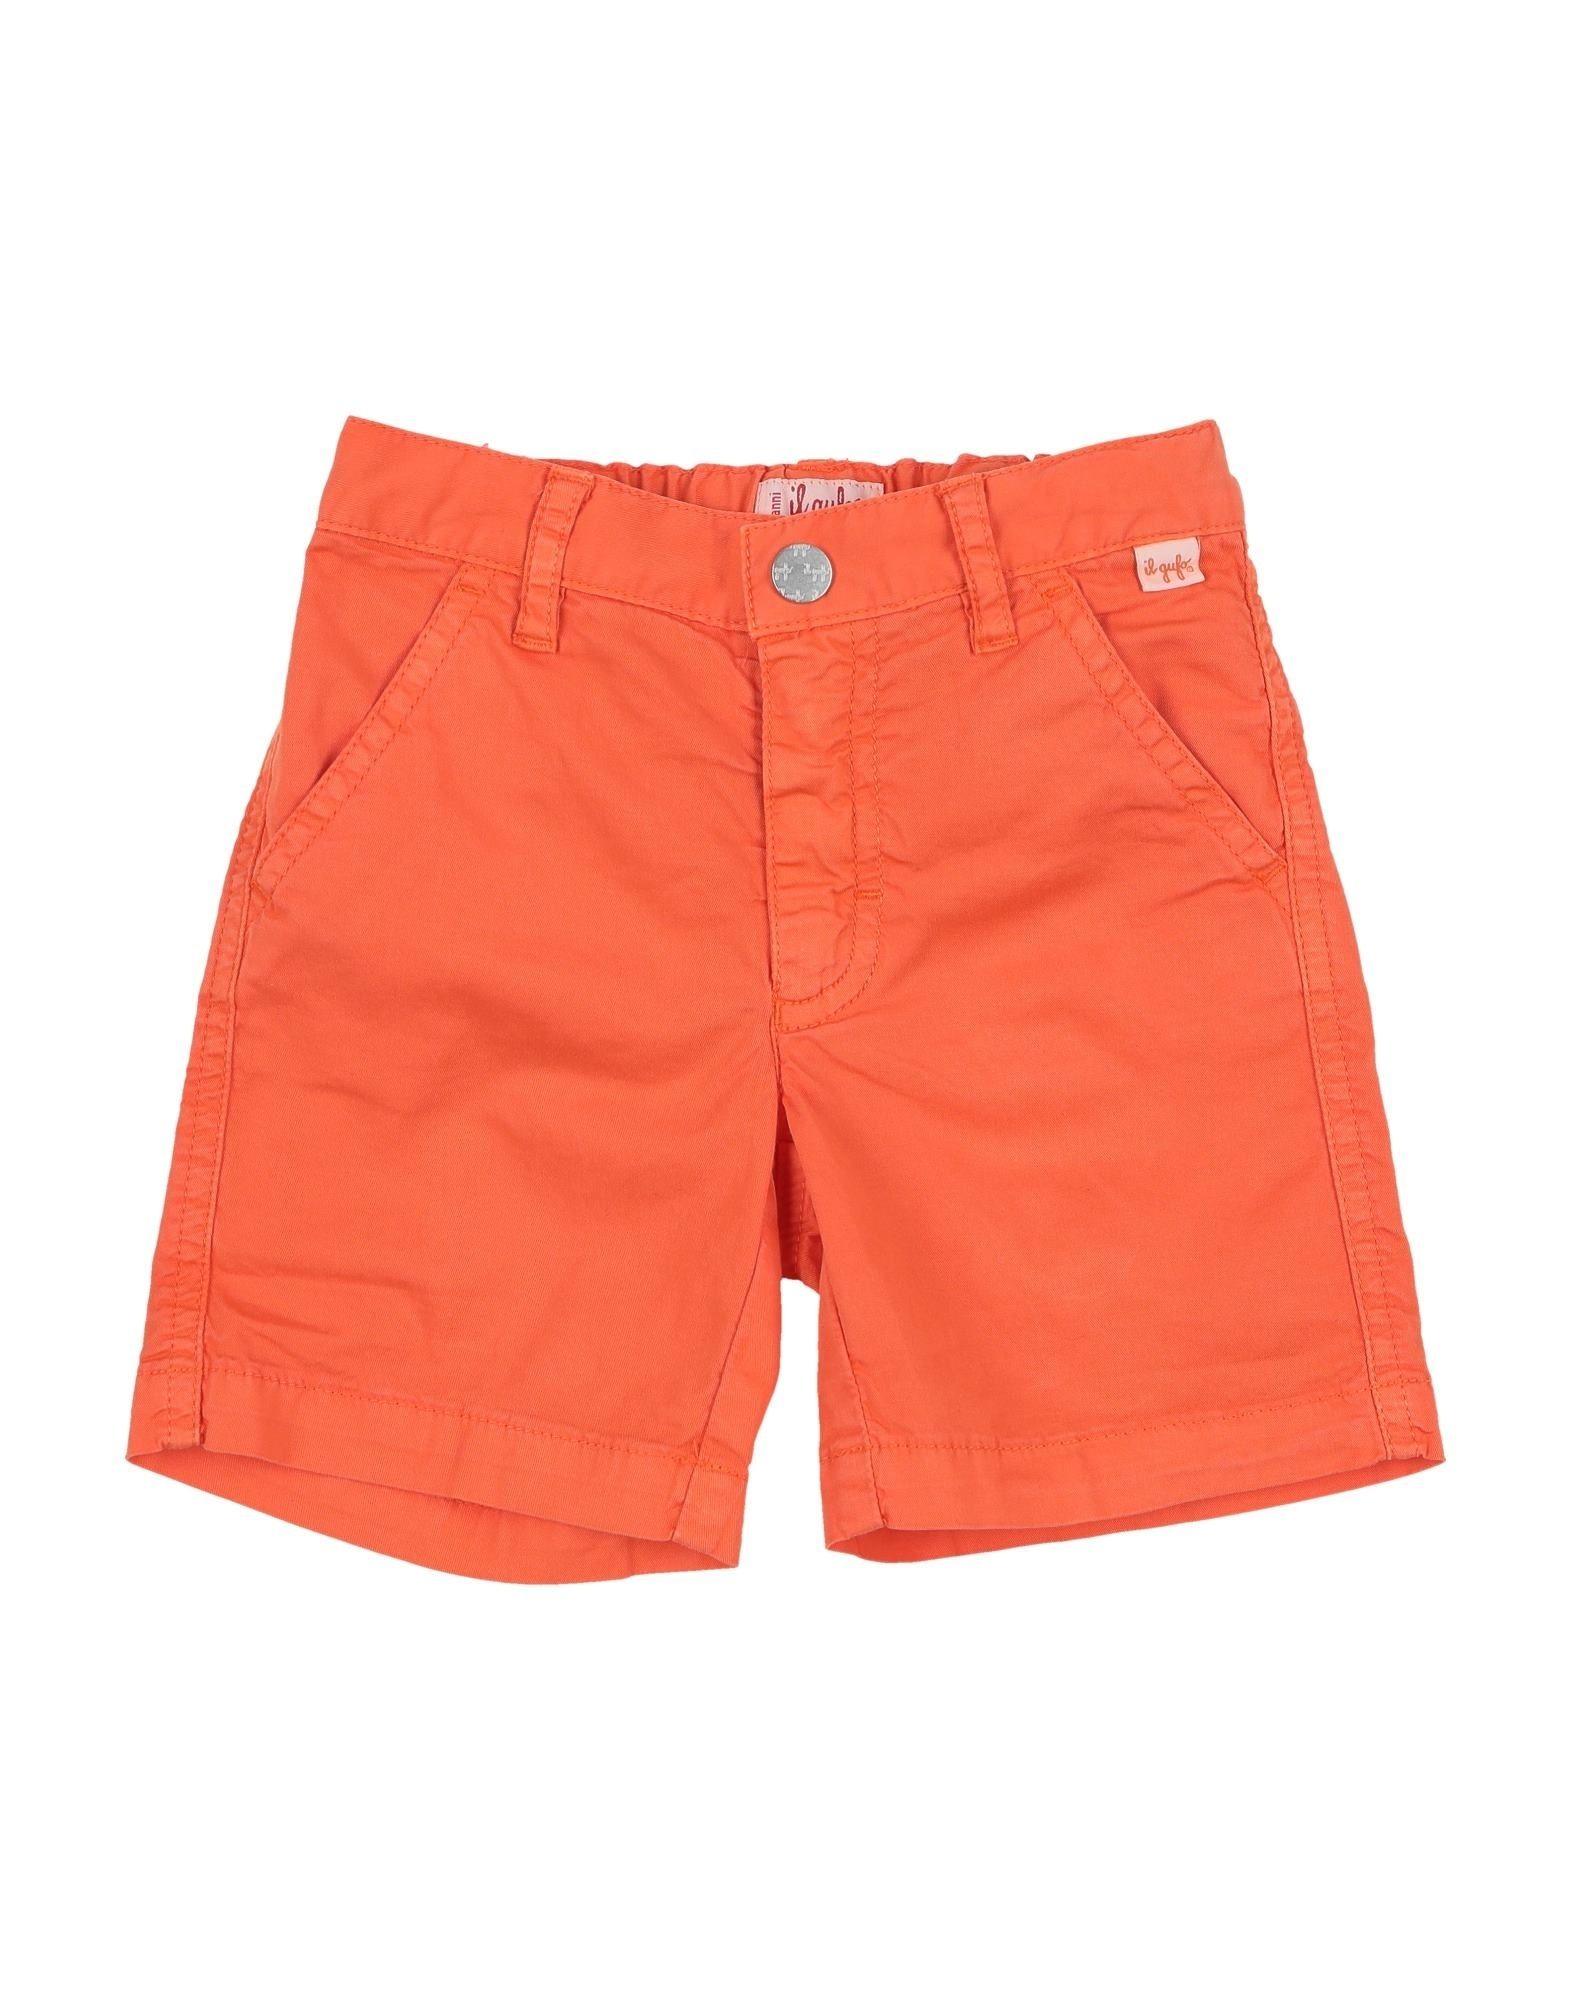 Il Gufo Kids' Bermudas In Orange